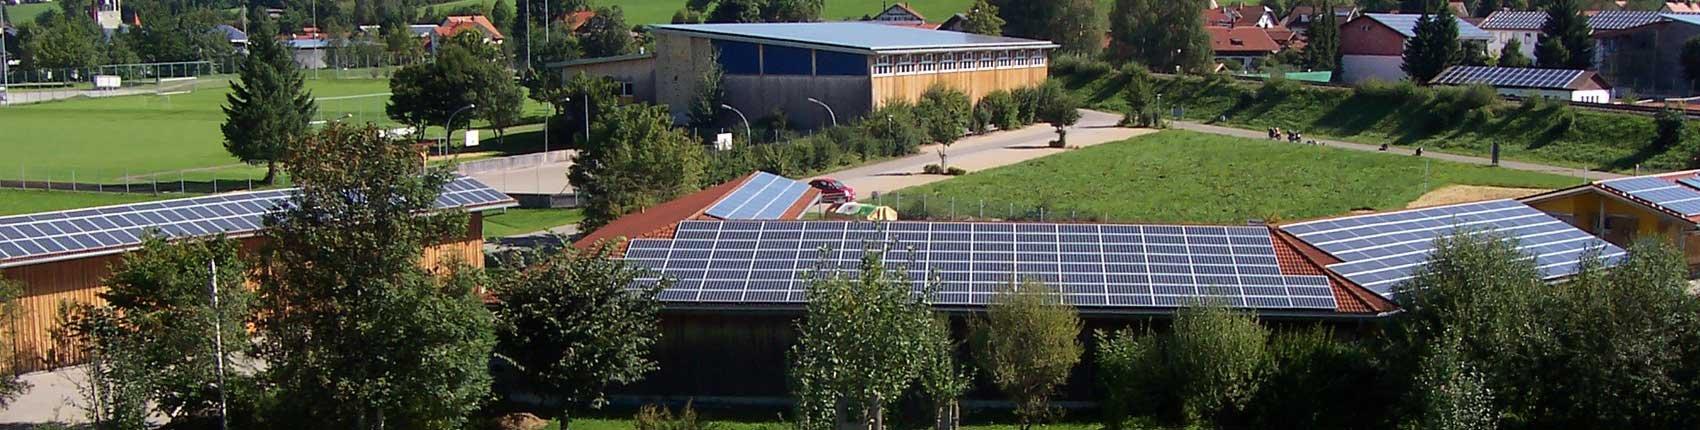 Wildpoldsried, a zöld energia faluja.